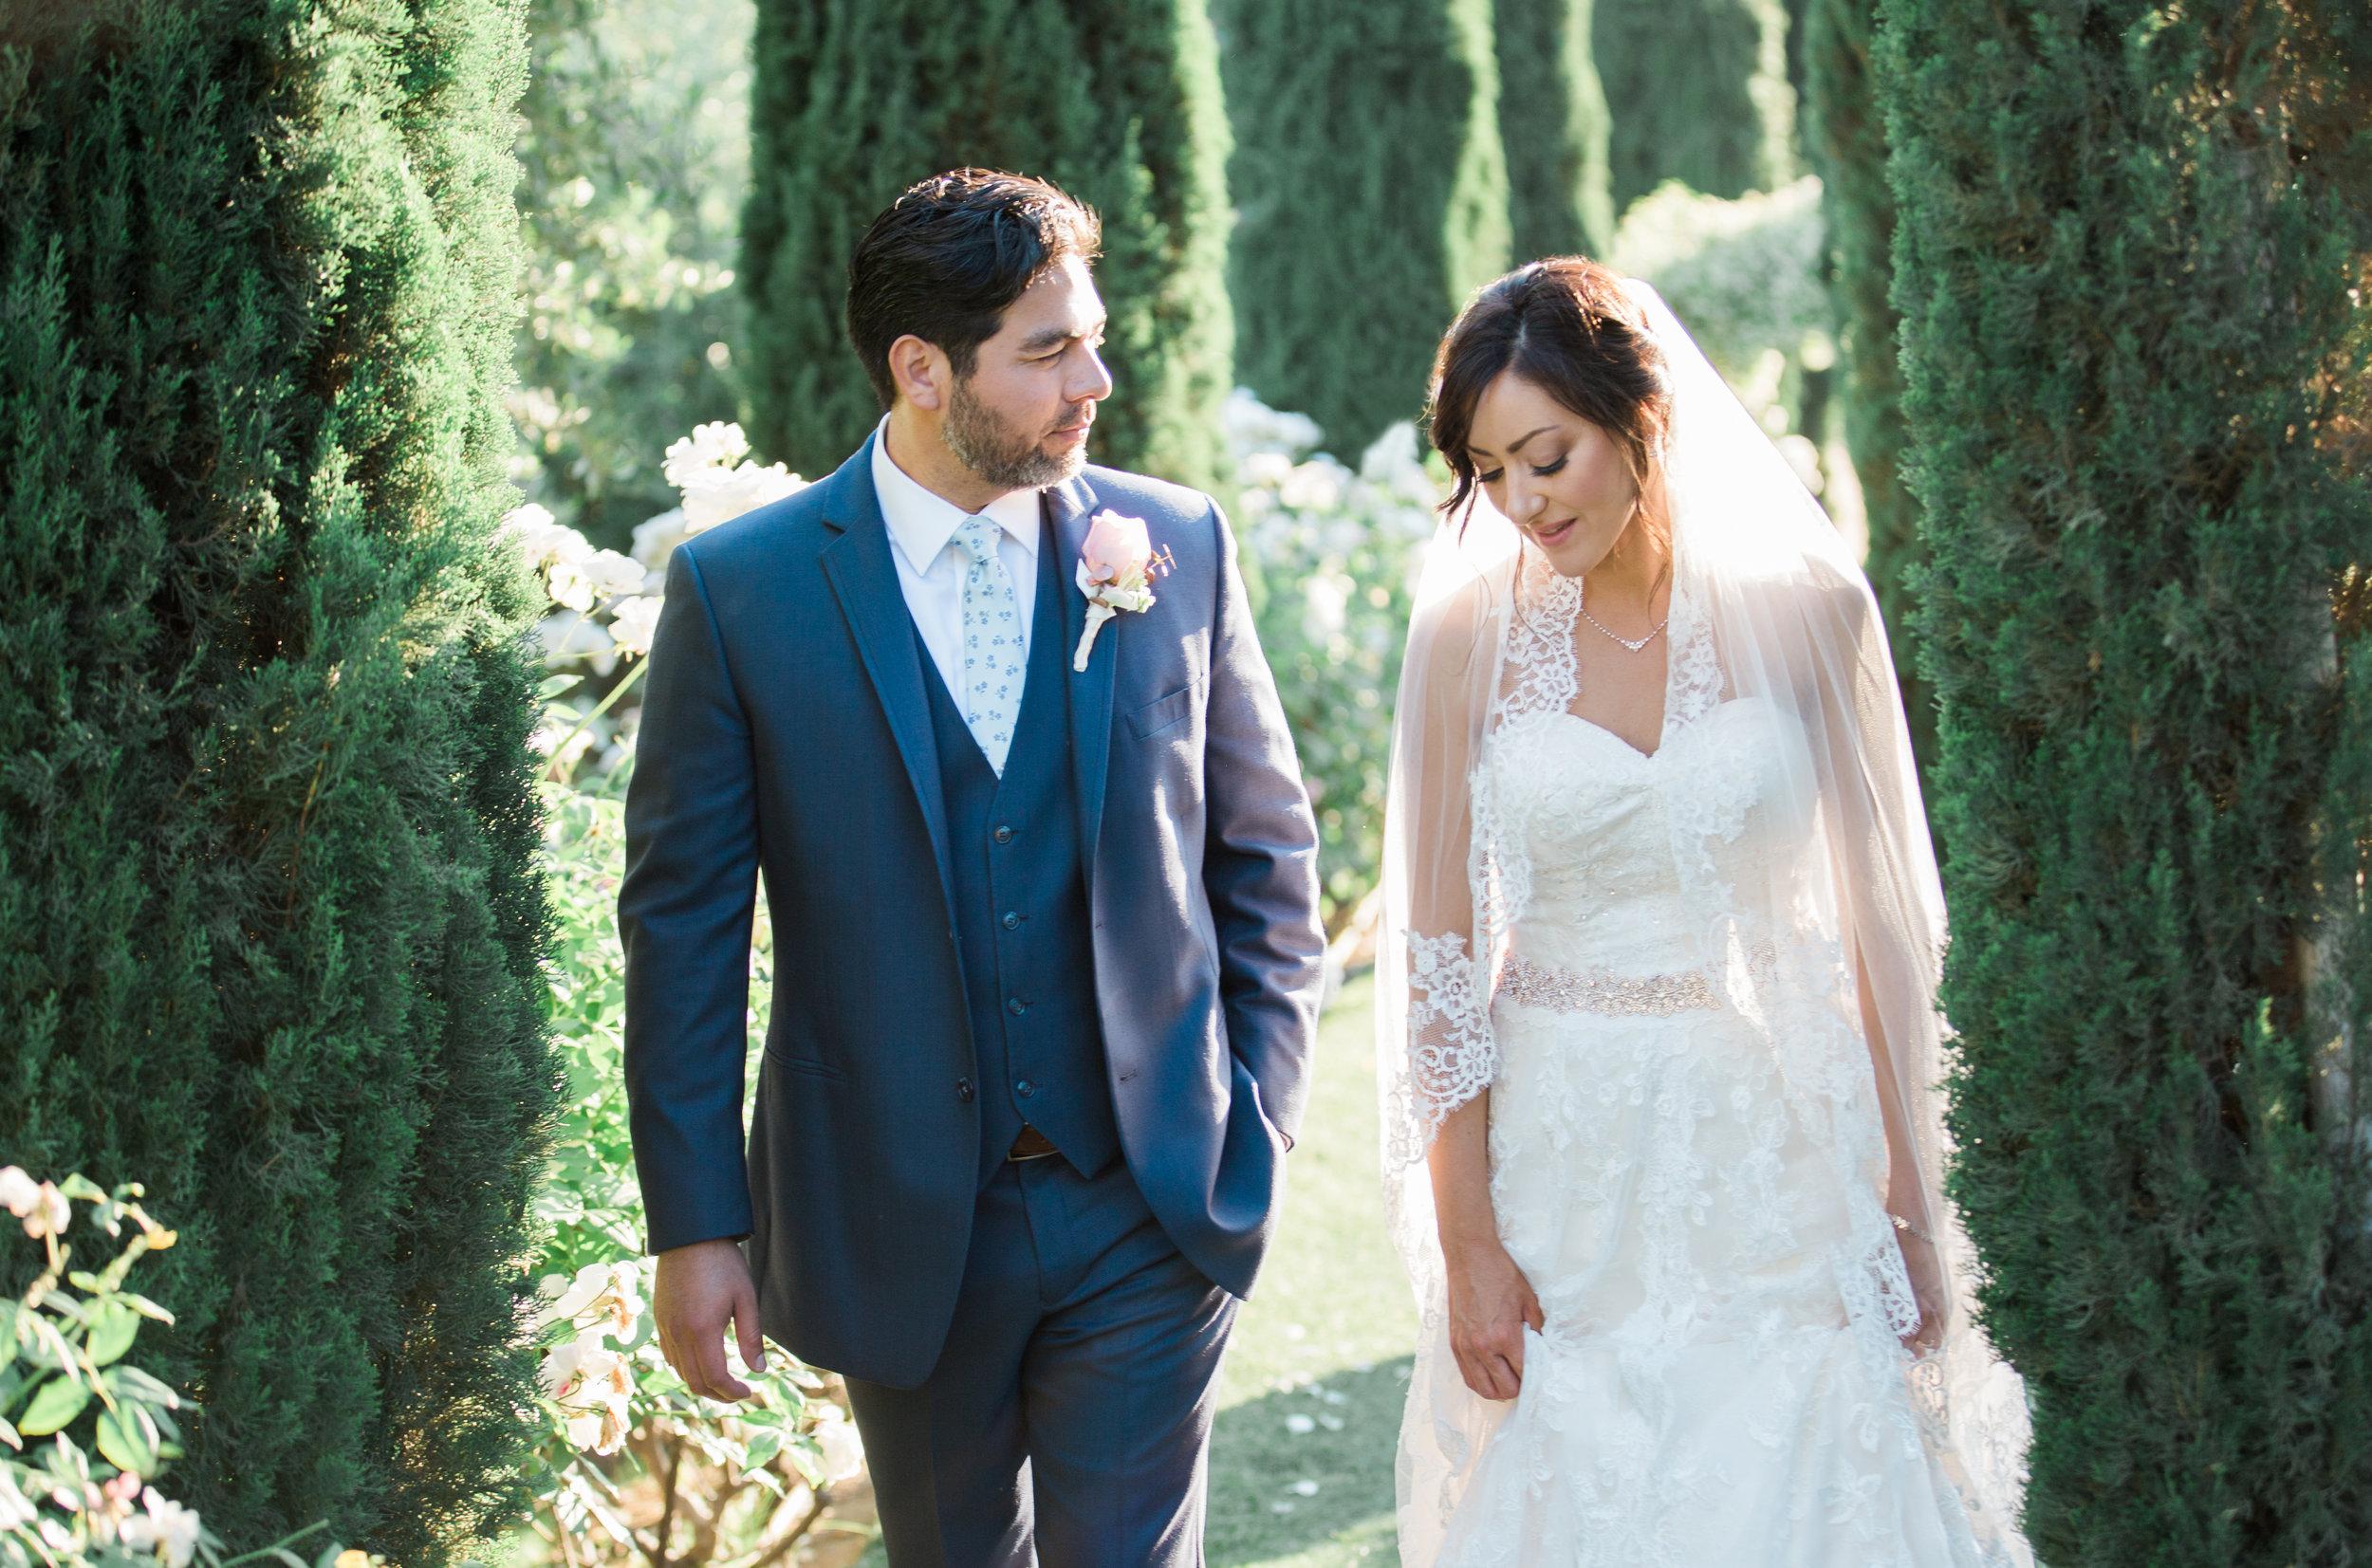 Falkner Winery Wedding Photographer Leah Vis  (1).jpg